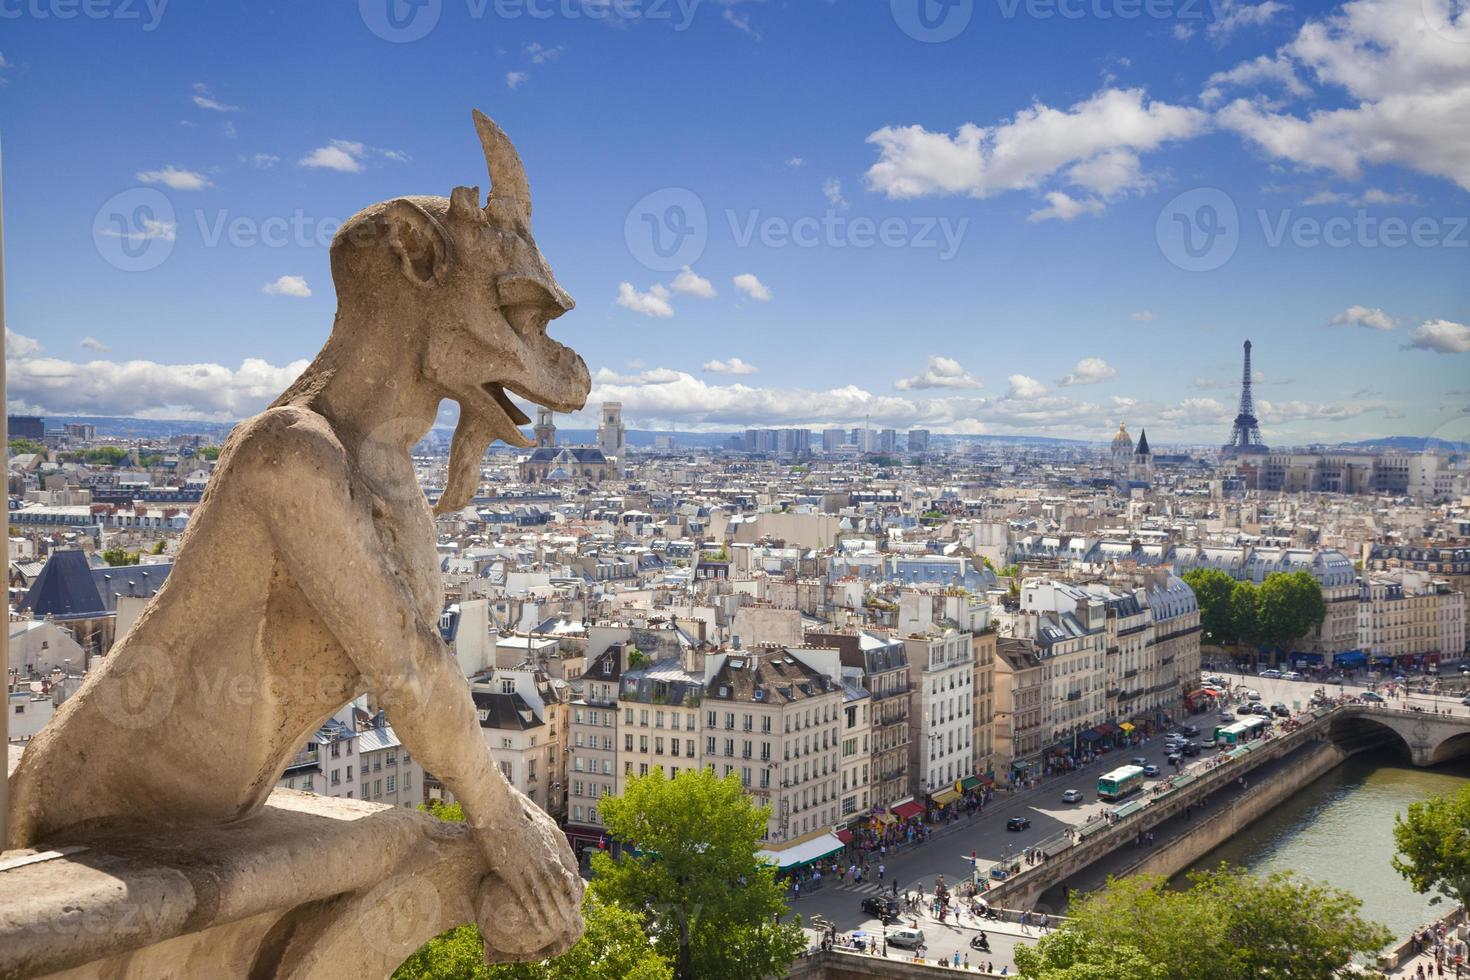 Notre Dame: Chimera (demon) overlooking Paris skyline a summer day photo